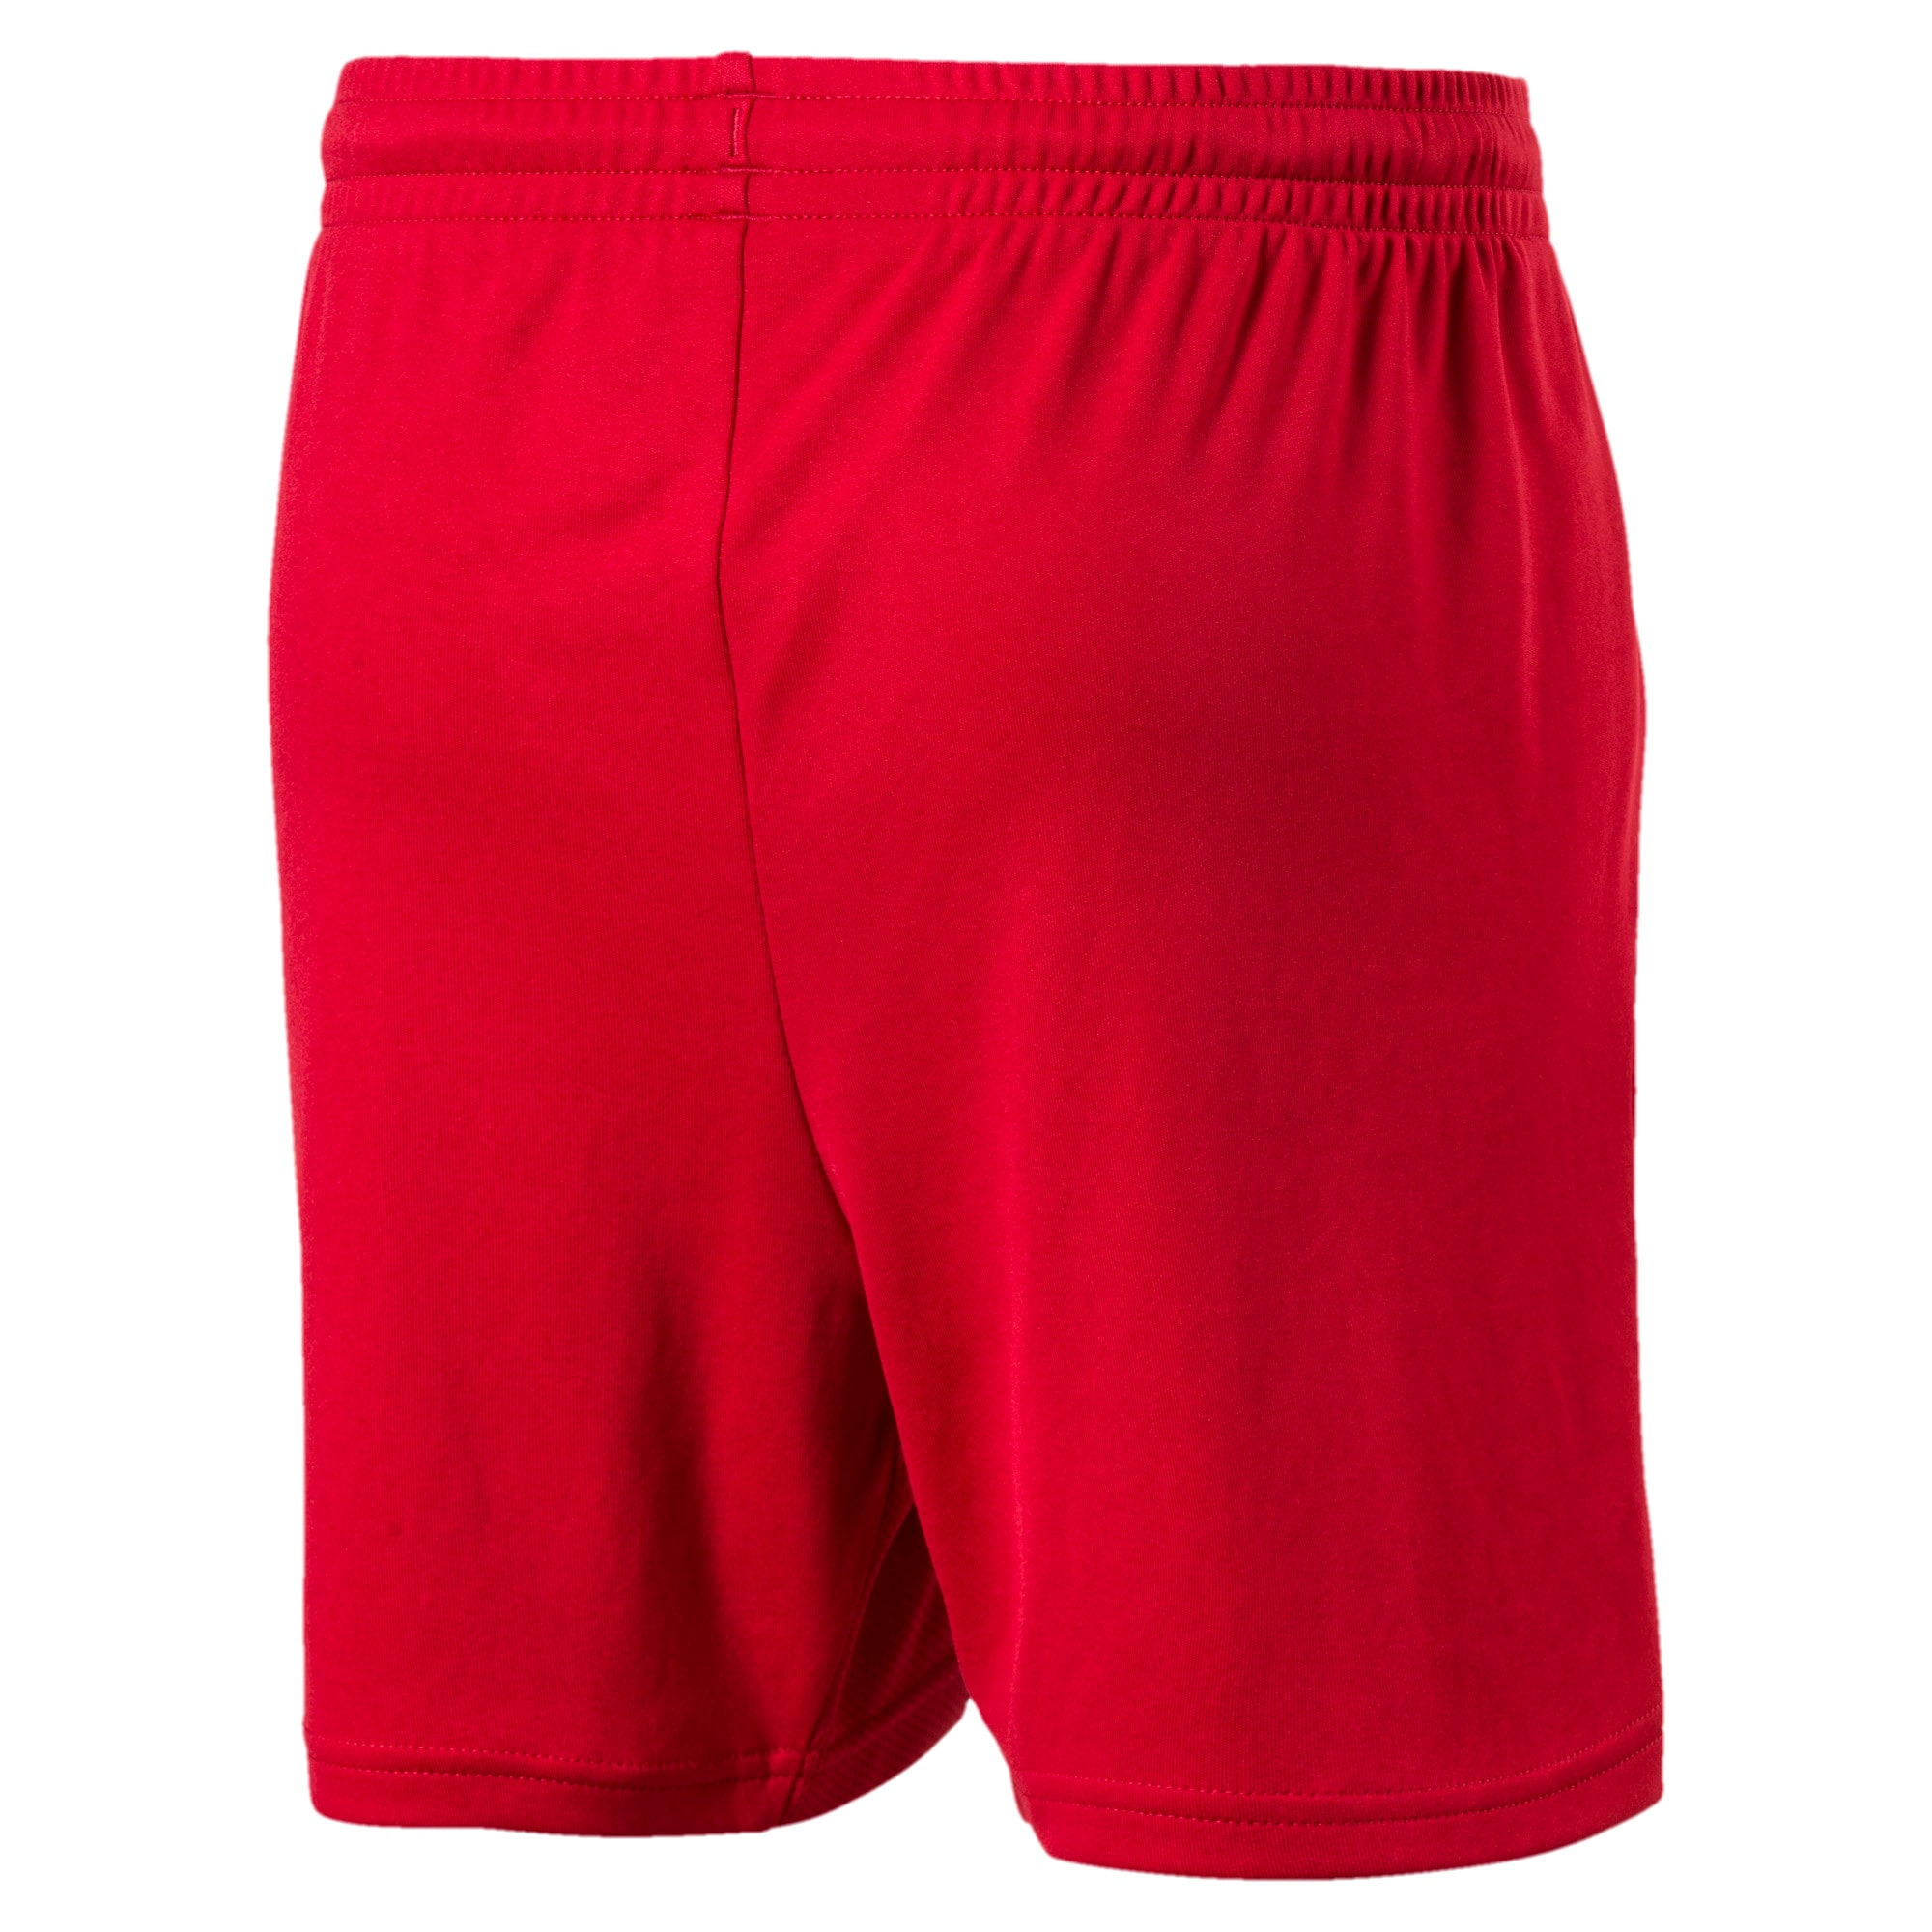 Thumbnail 2 of ftblTRG Kids' Football Training Shorts, Chili Pepper-Puma White, medium-IND